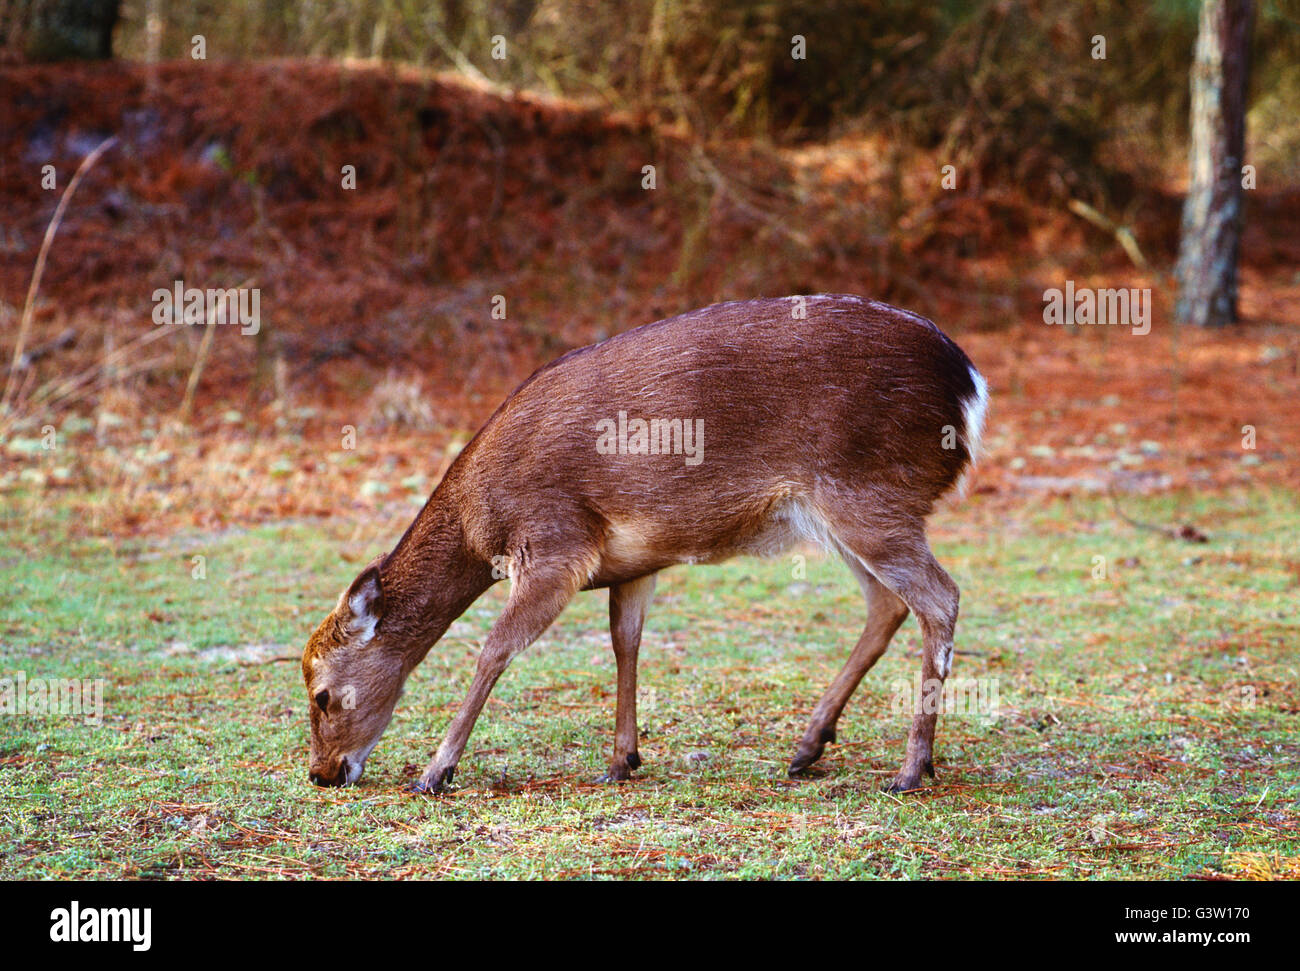 Sika Rotwild (Cervus Nippon); Chincoteague National Wildlife Refuge, Assateague Island, Virginia, USA Stockbild